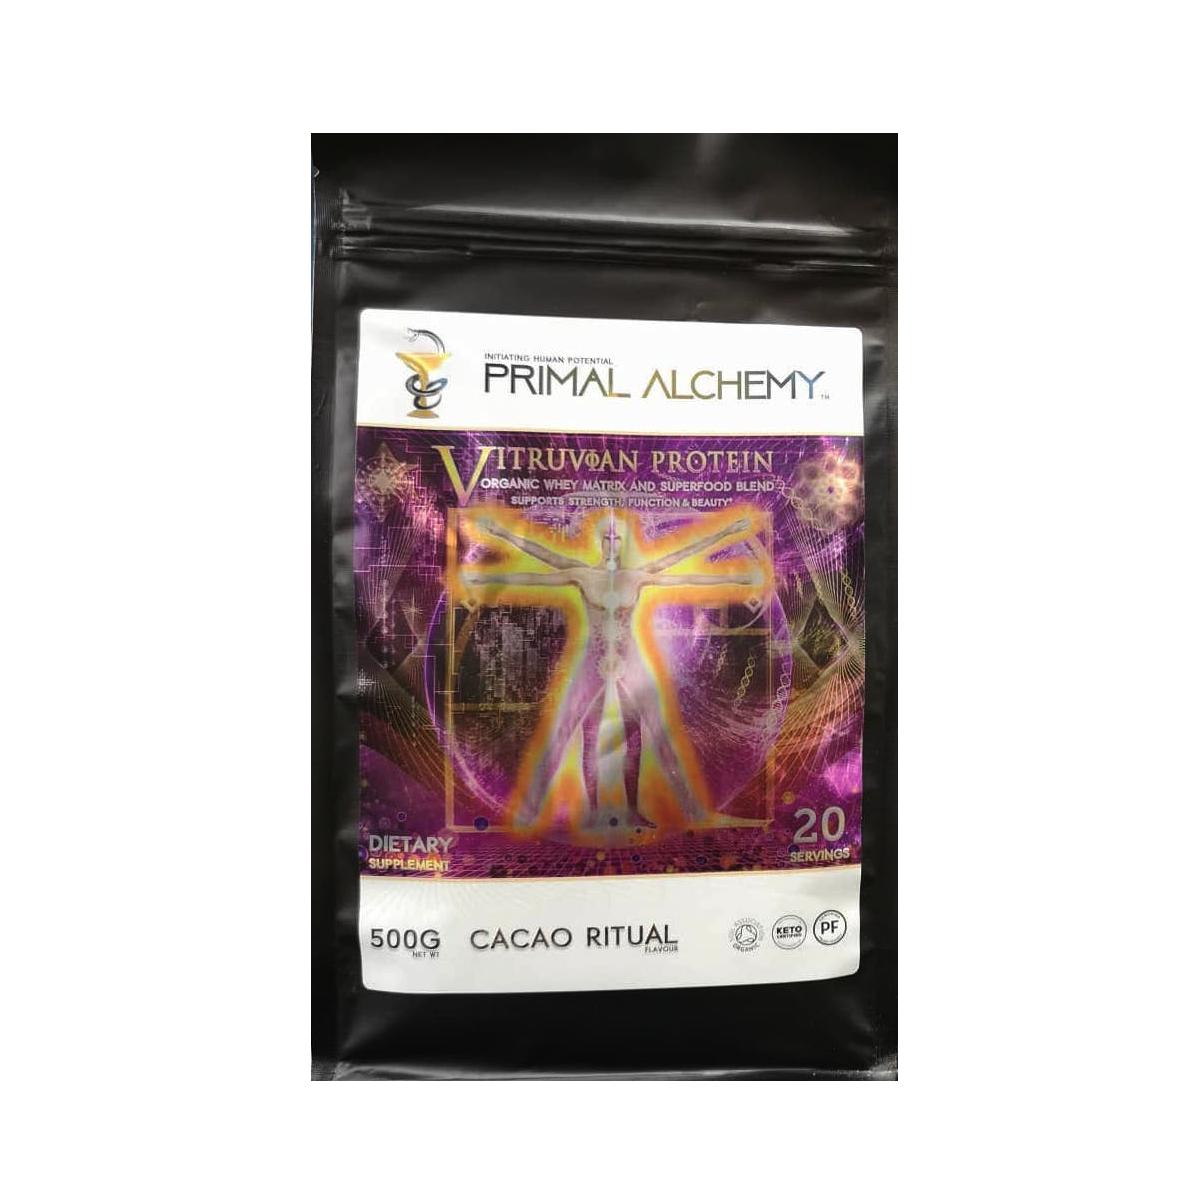 Vitruvian Protein - Primal Alchemy - Certified Paleo Friendly, KETO Certified by the Paleo Foundation